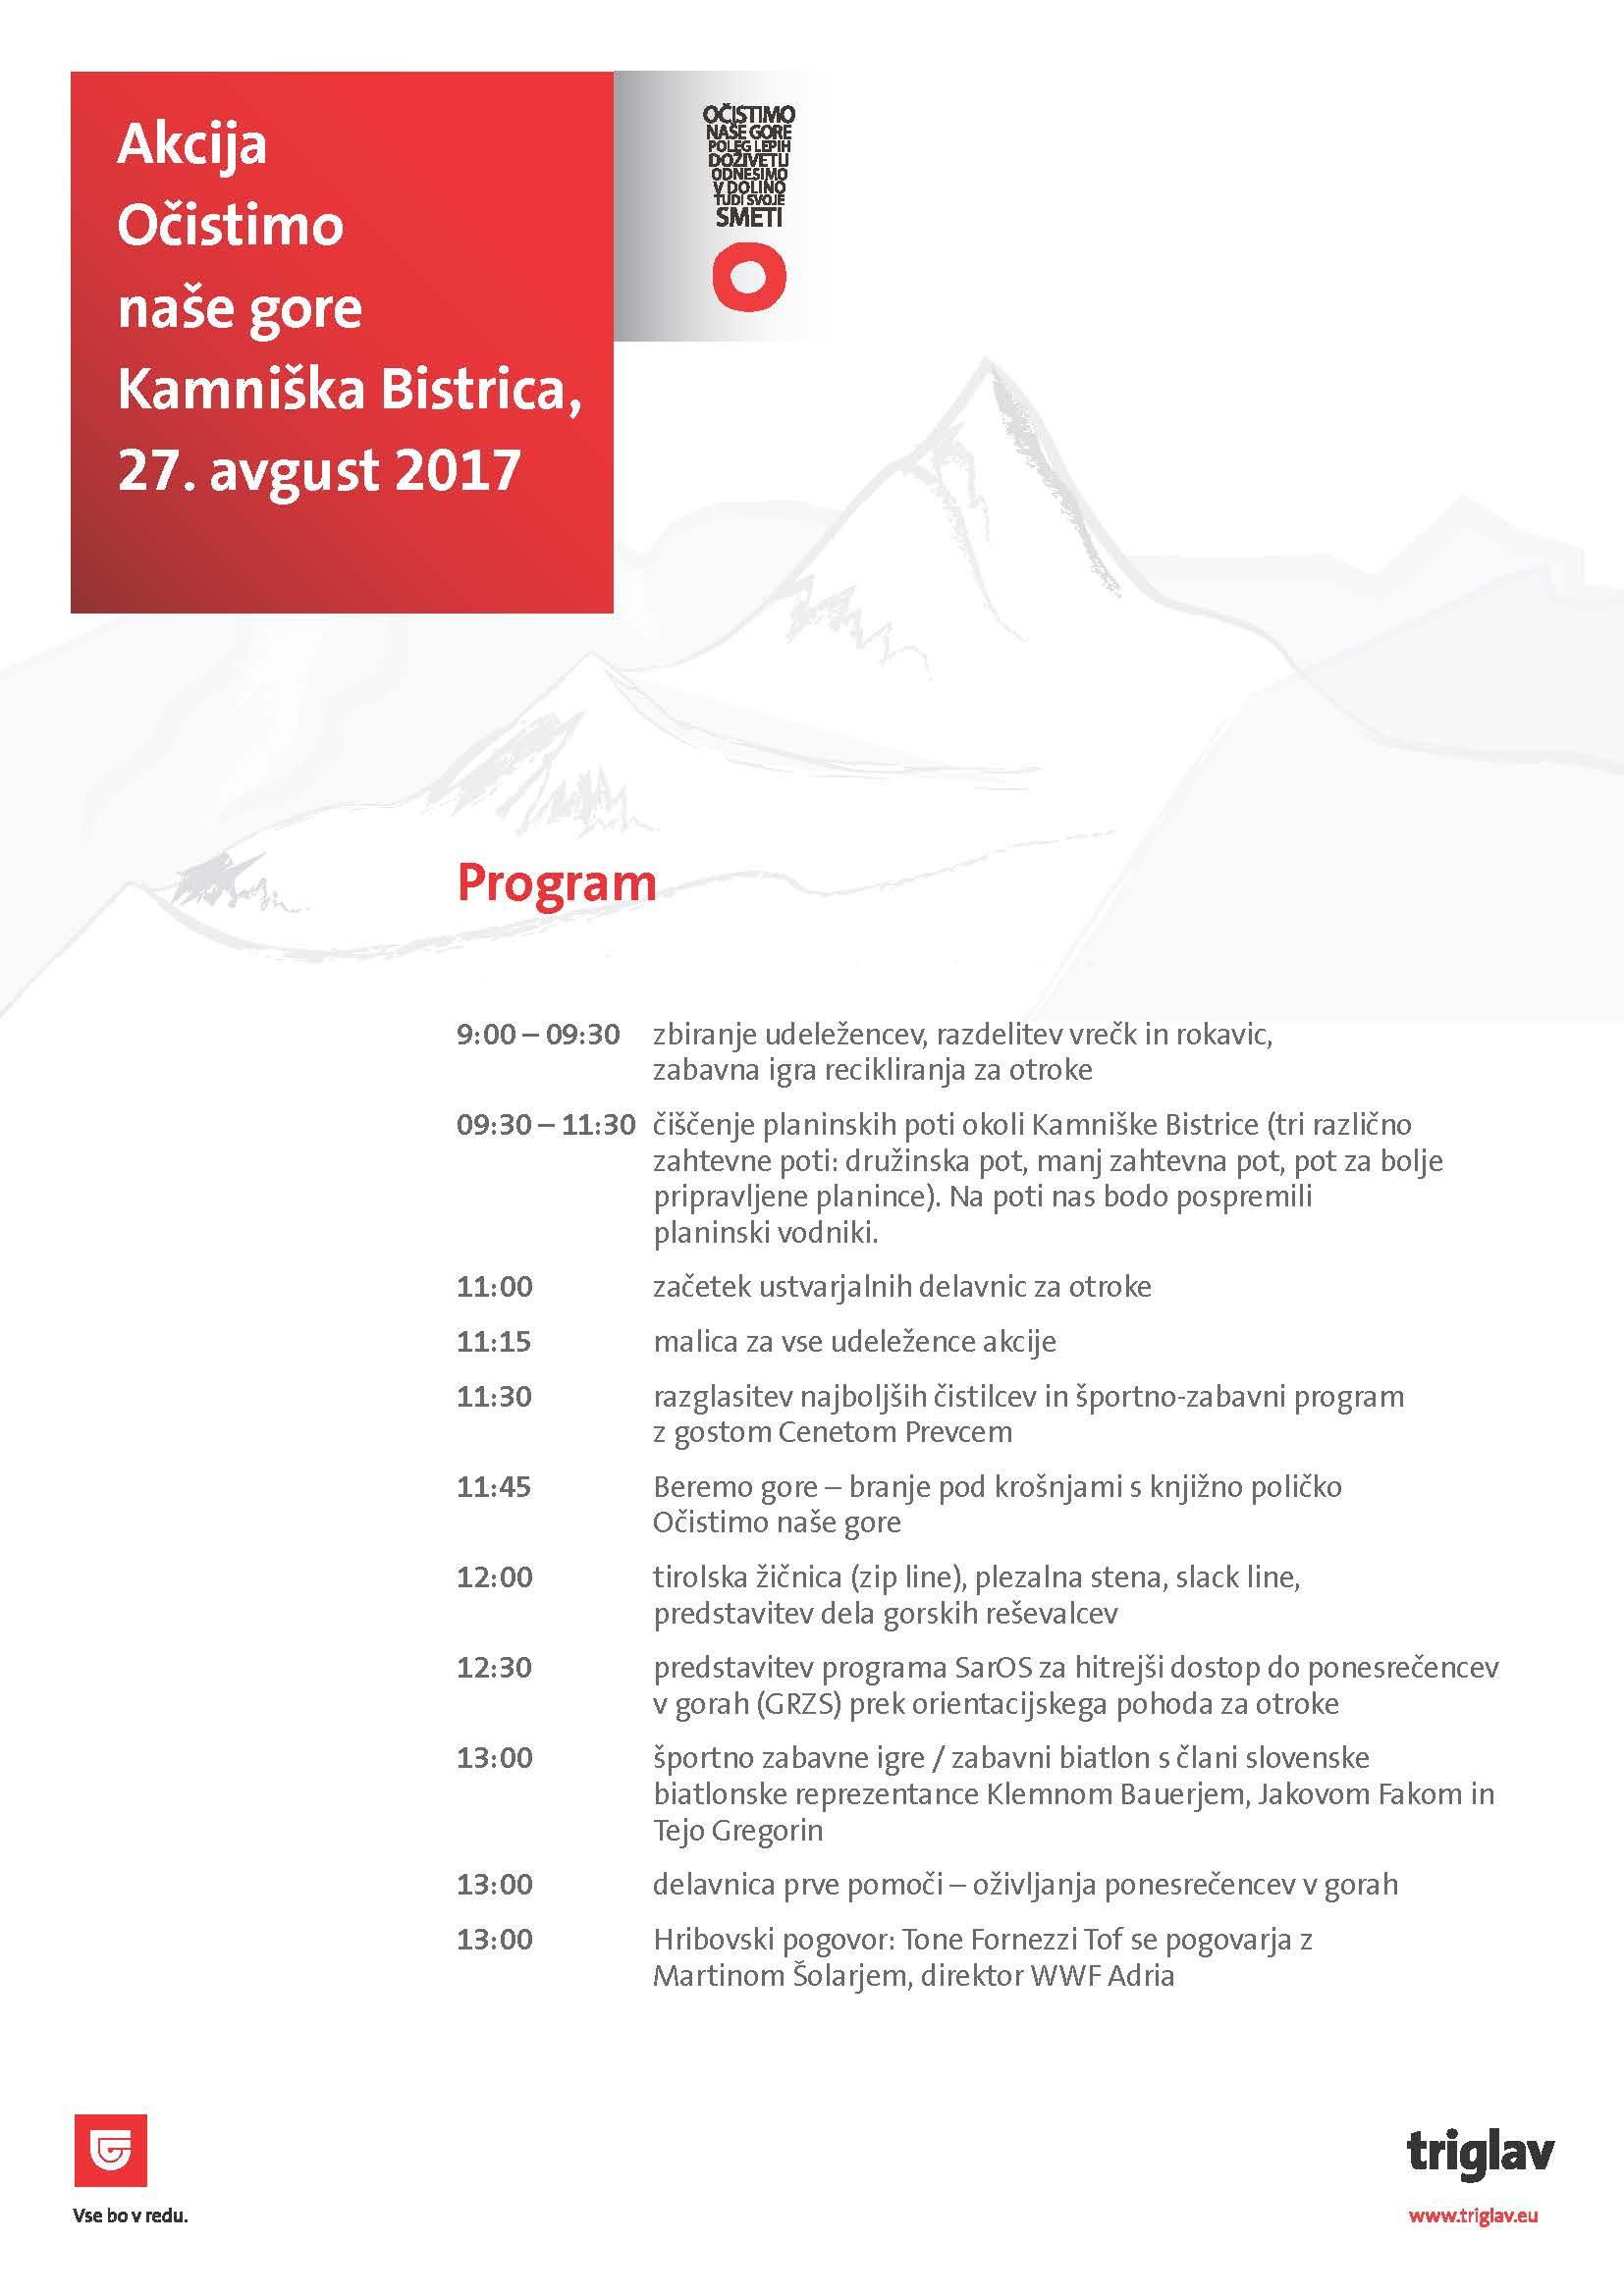 ong_program_kamniska_bistrica